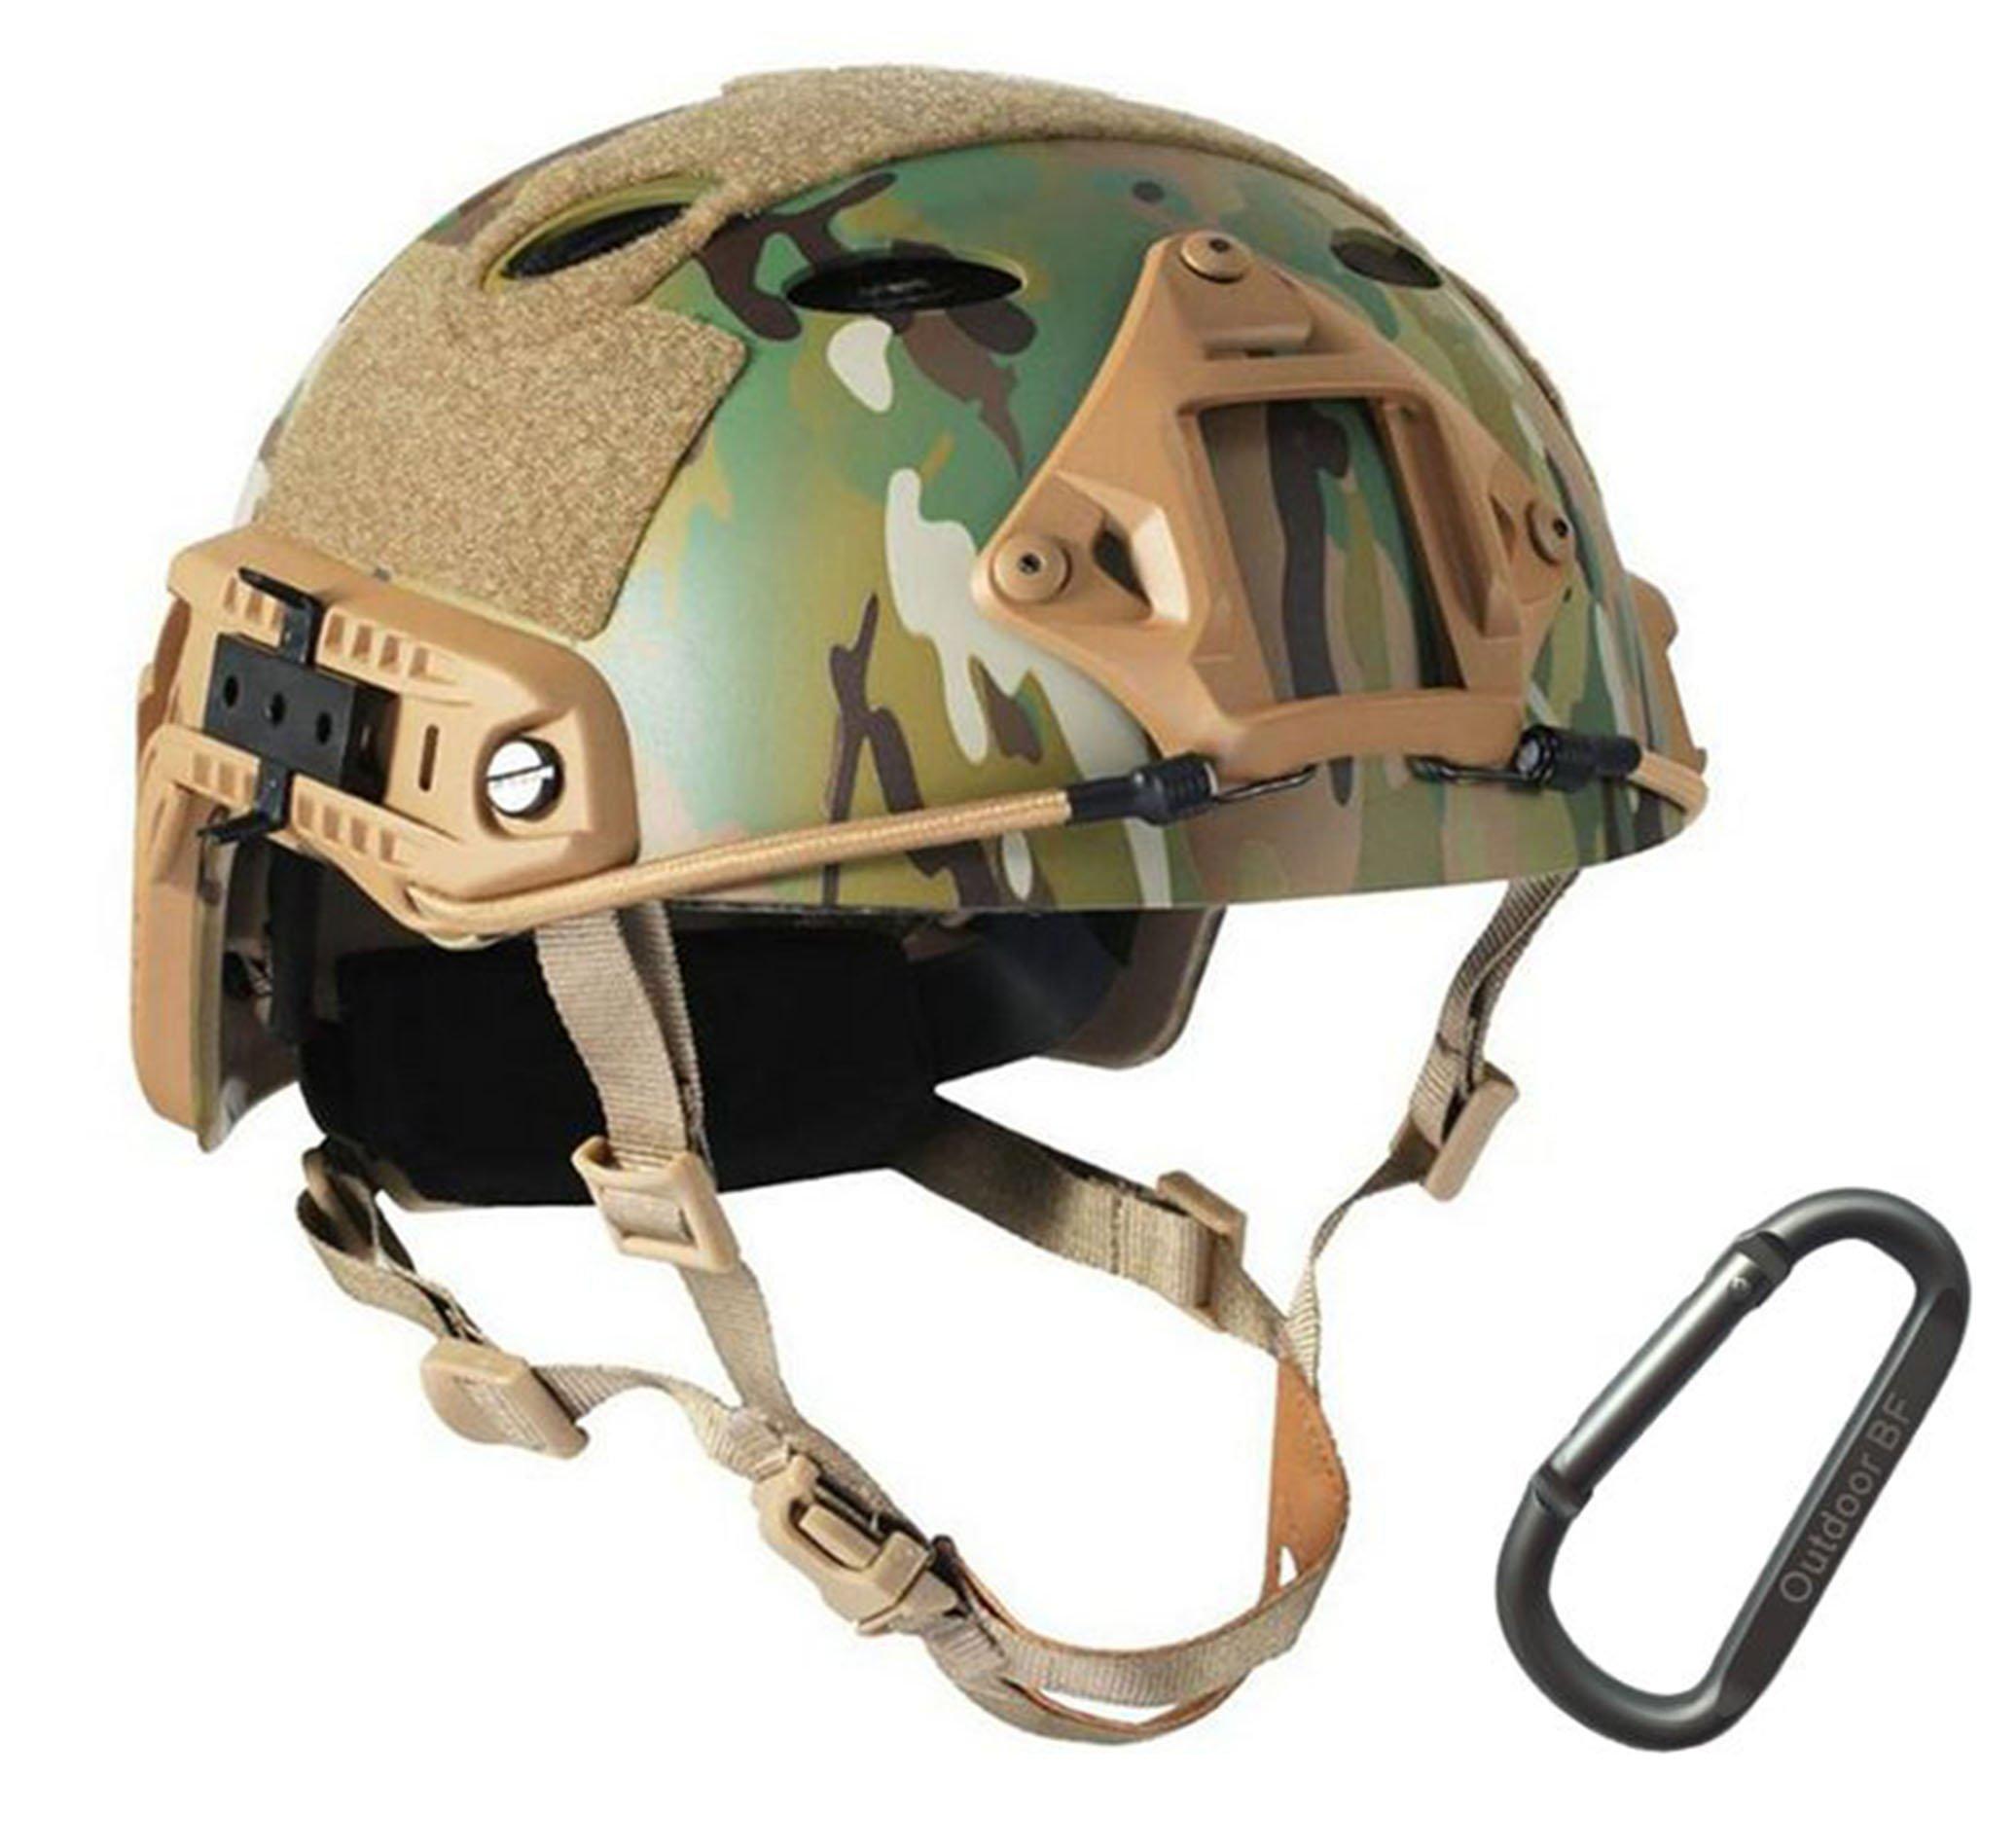 Tactical Fast Adjustable Helmet PJ Type (MC) by Outdoor BF